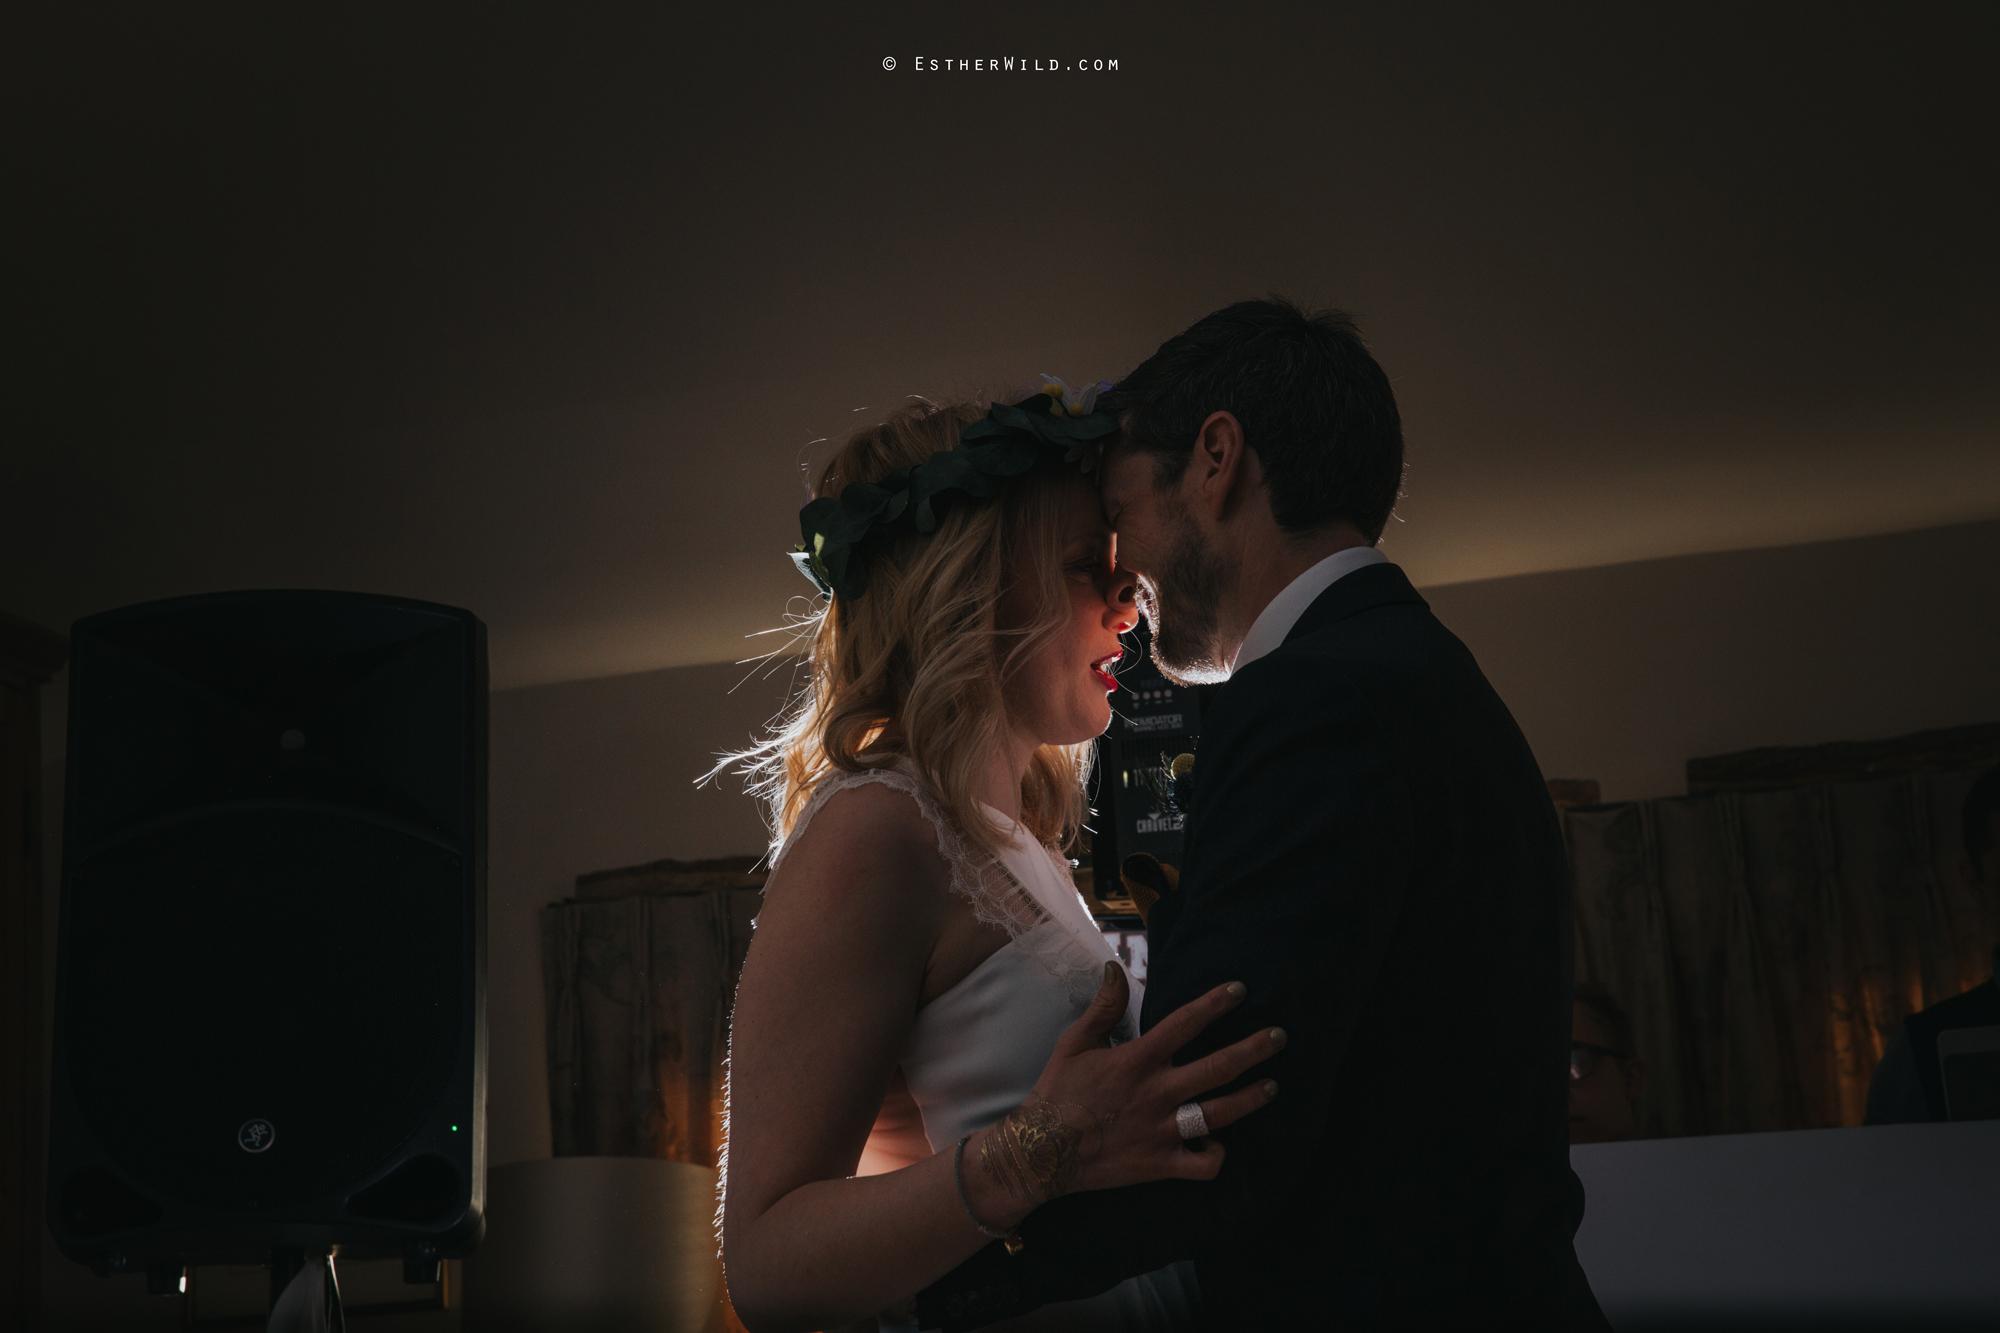 IMG_2249Cley_Barn_Drift_Norfolk_Coast_Wedding_Copyright_Esther_Wild_Photographer_.jpg